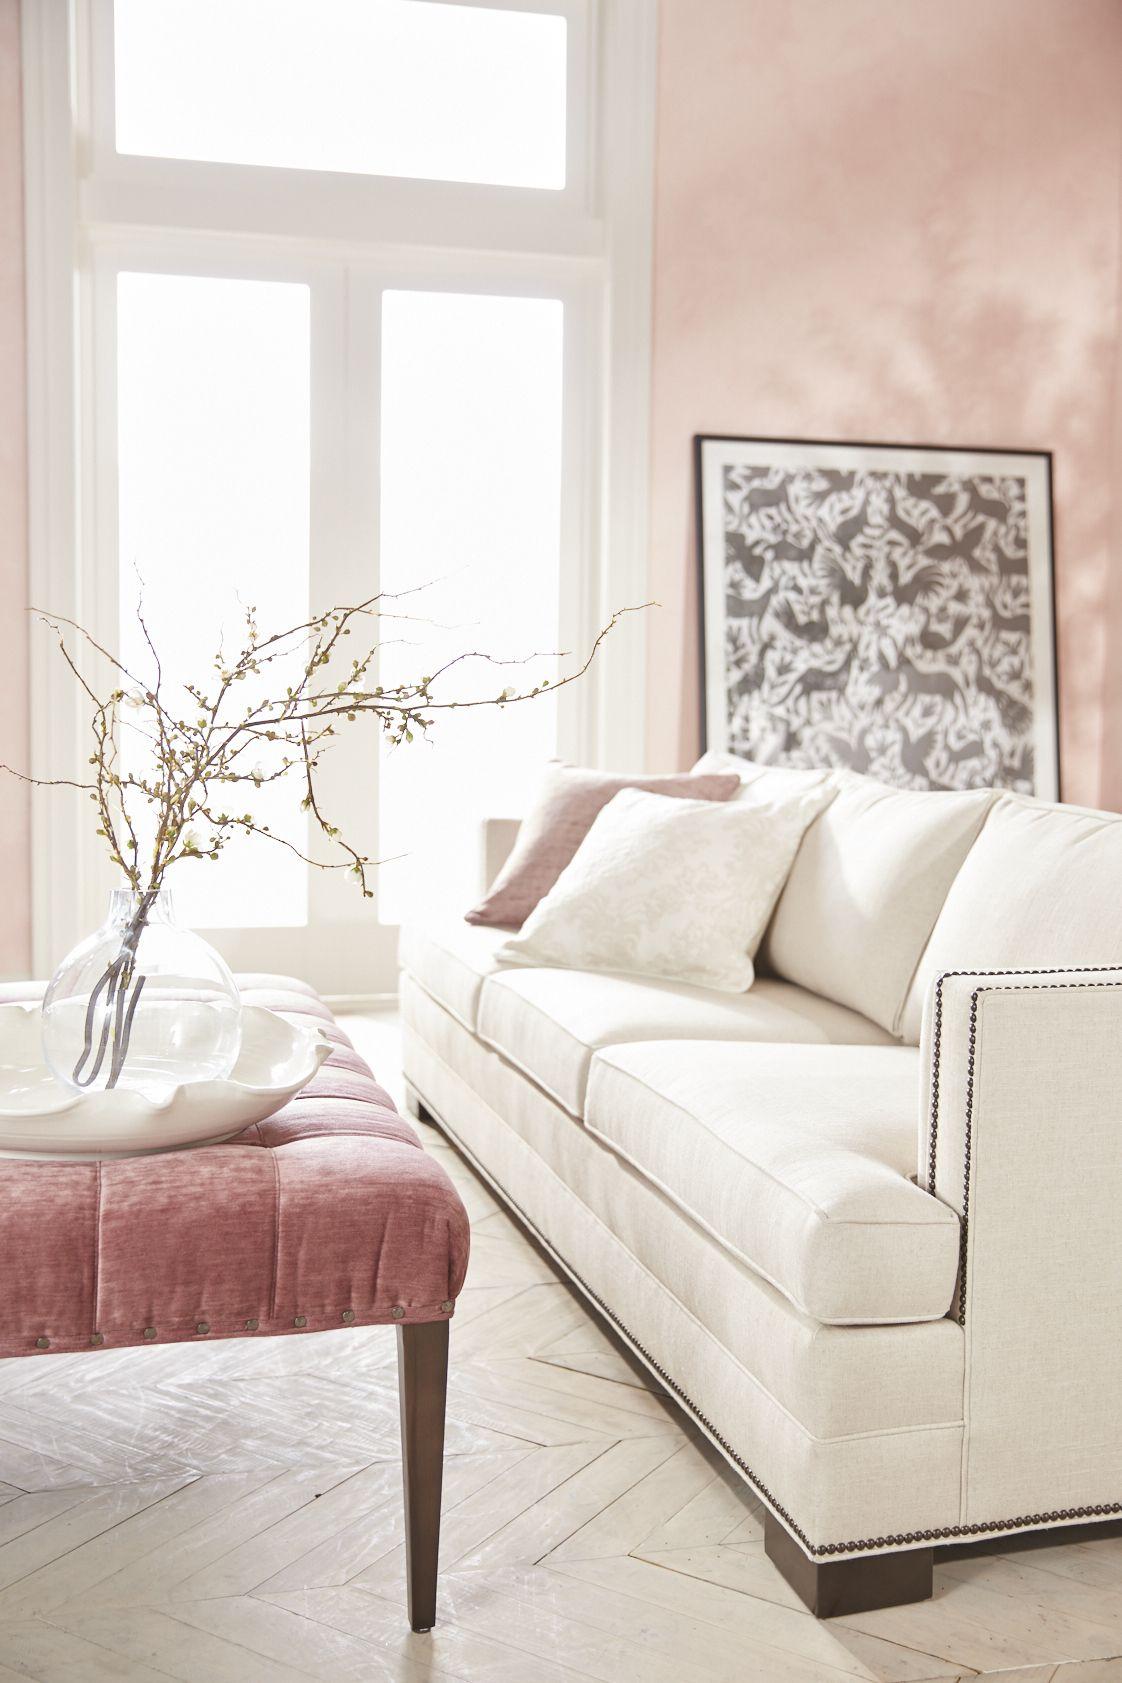 Tremendous Astor Sofa In 2019 Living Room Sofa Elegant Home Decor Creativecarmelina Interior Chair Design Creativecarmelinacom